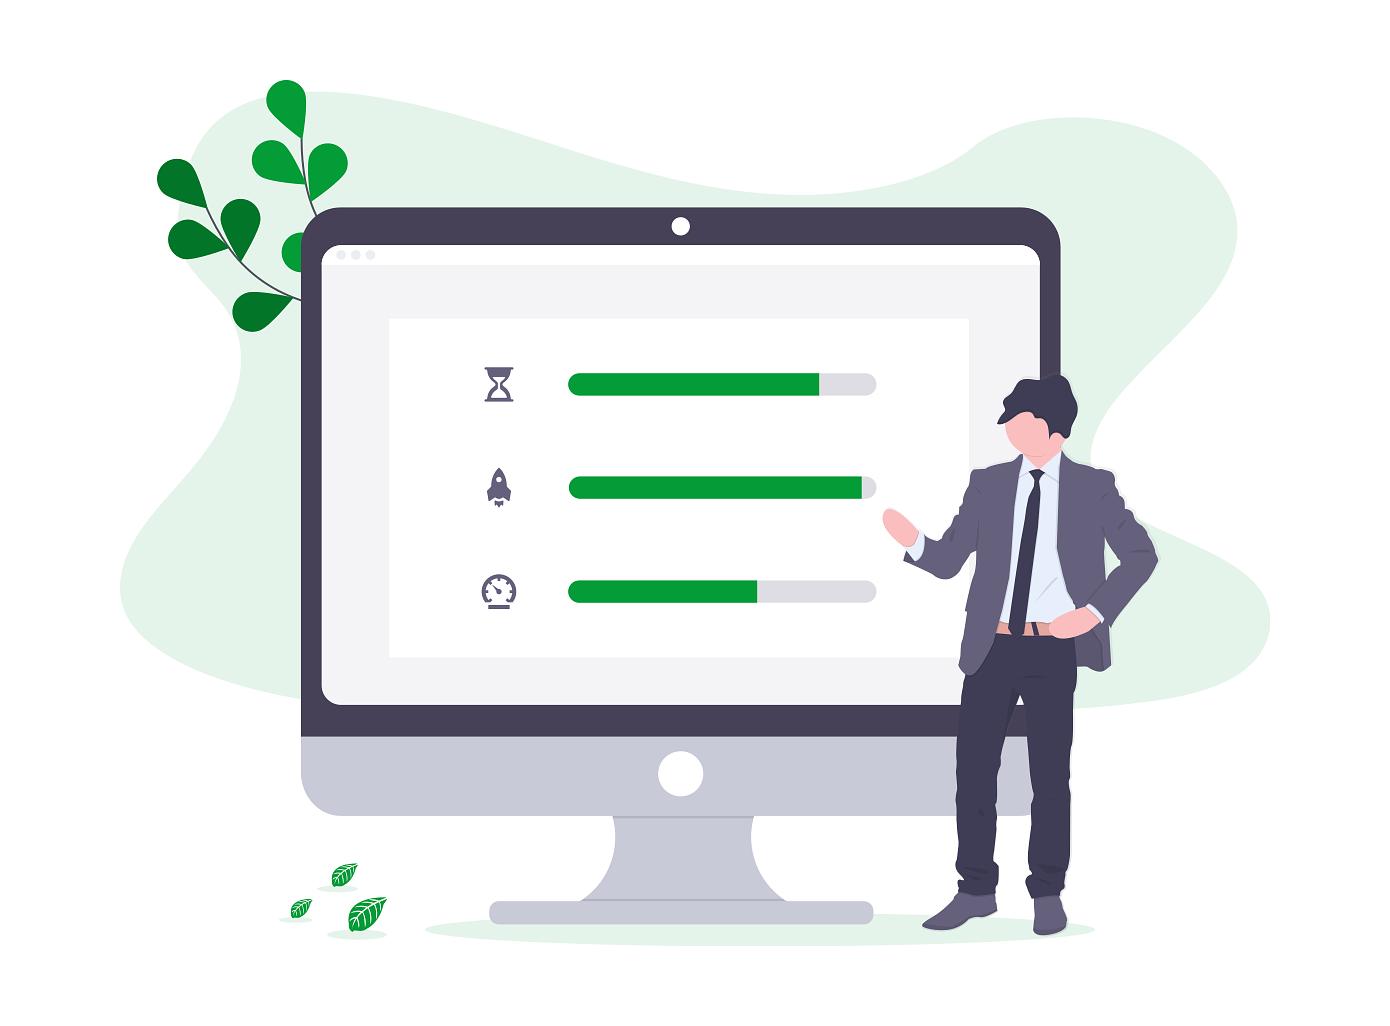 using a cdn may help boost website performance